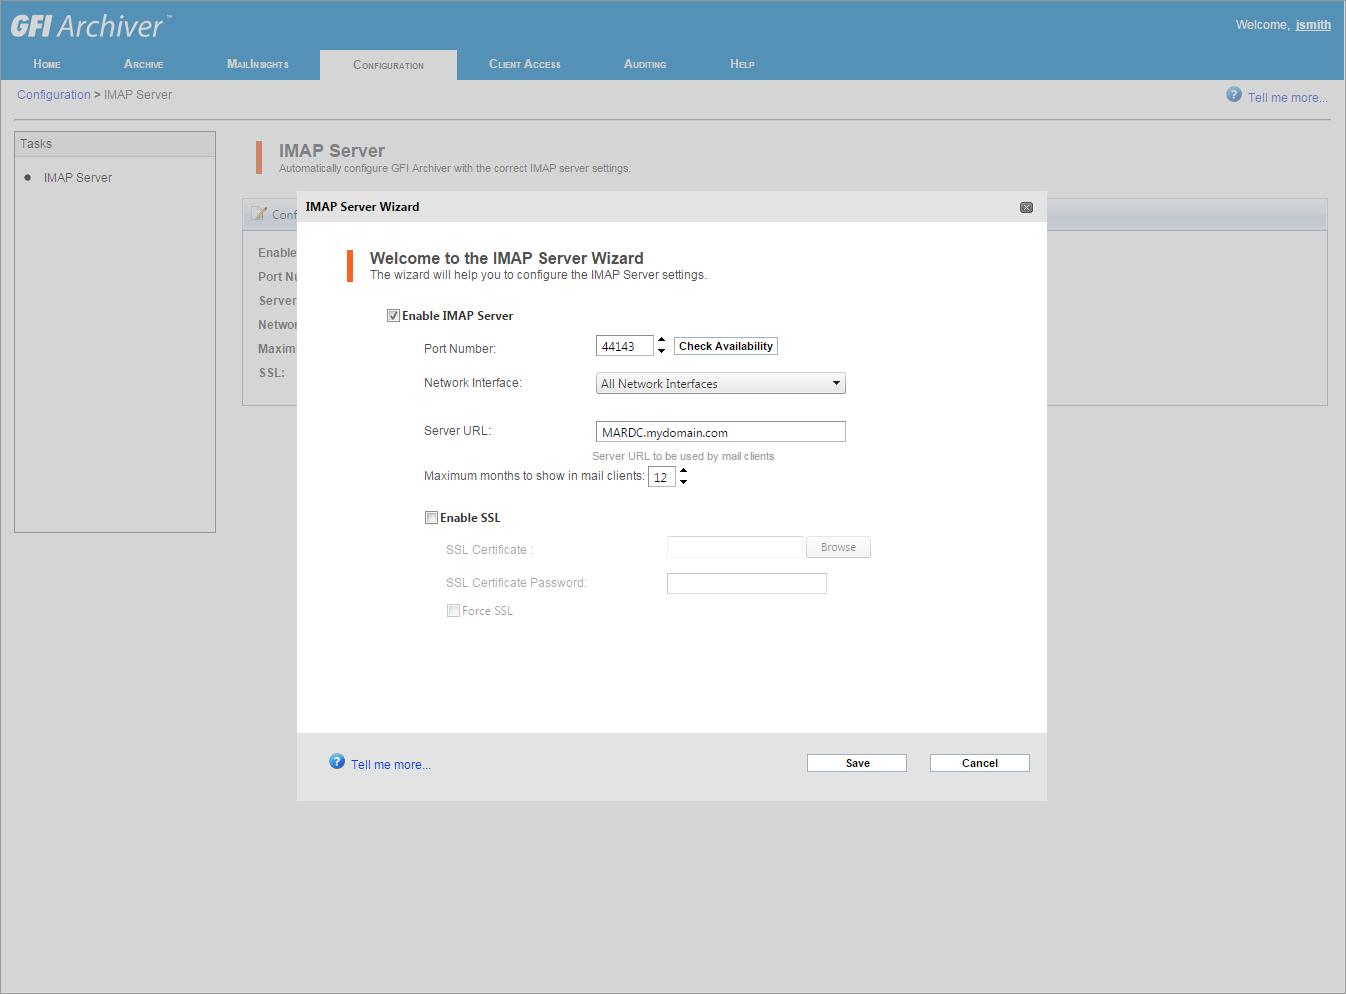 Configure IMAP for email client integration